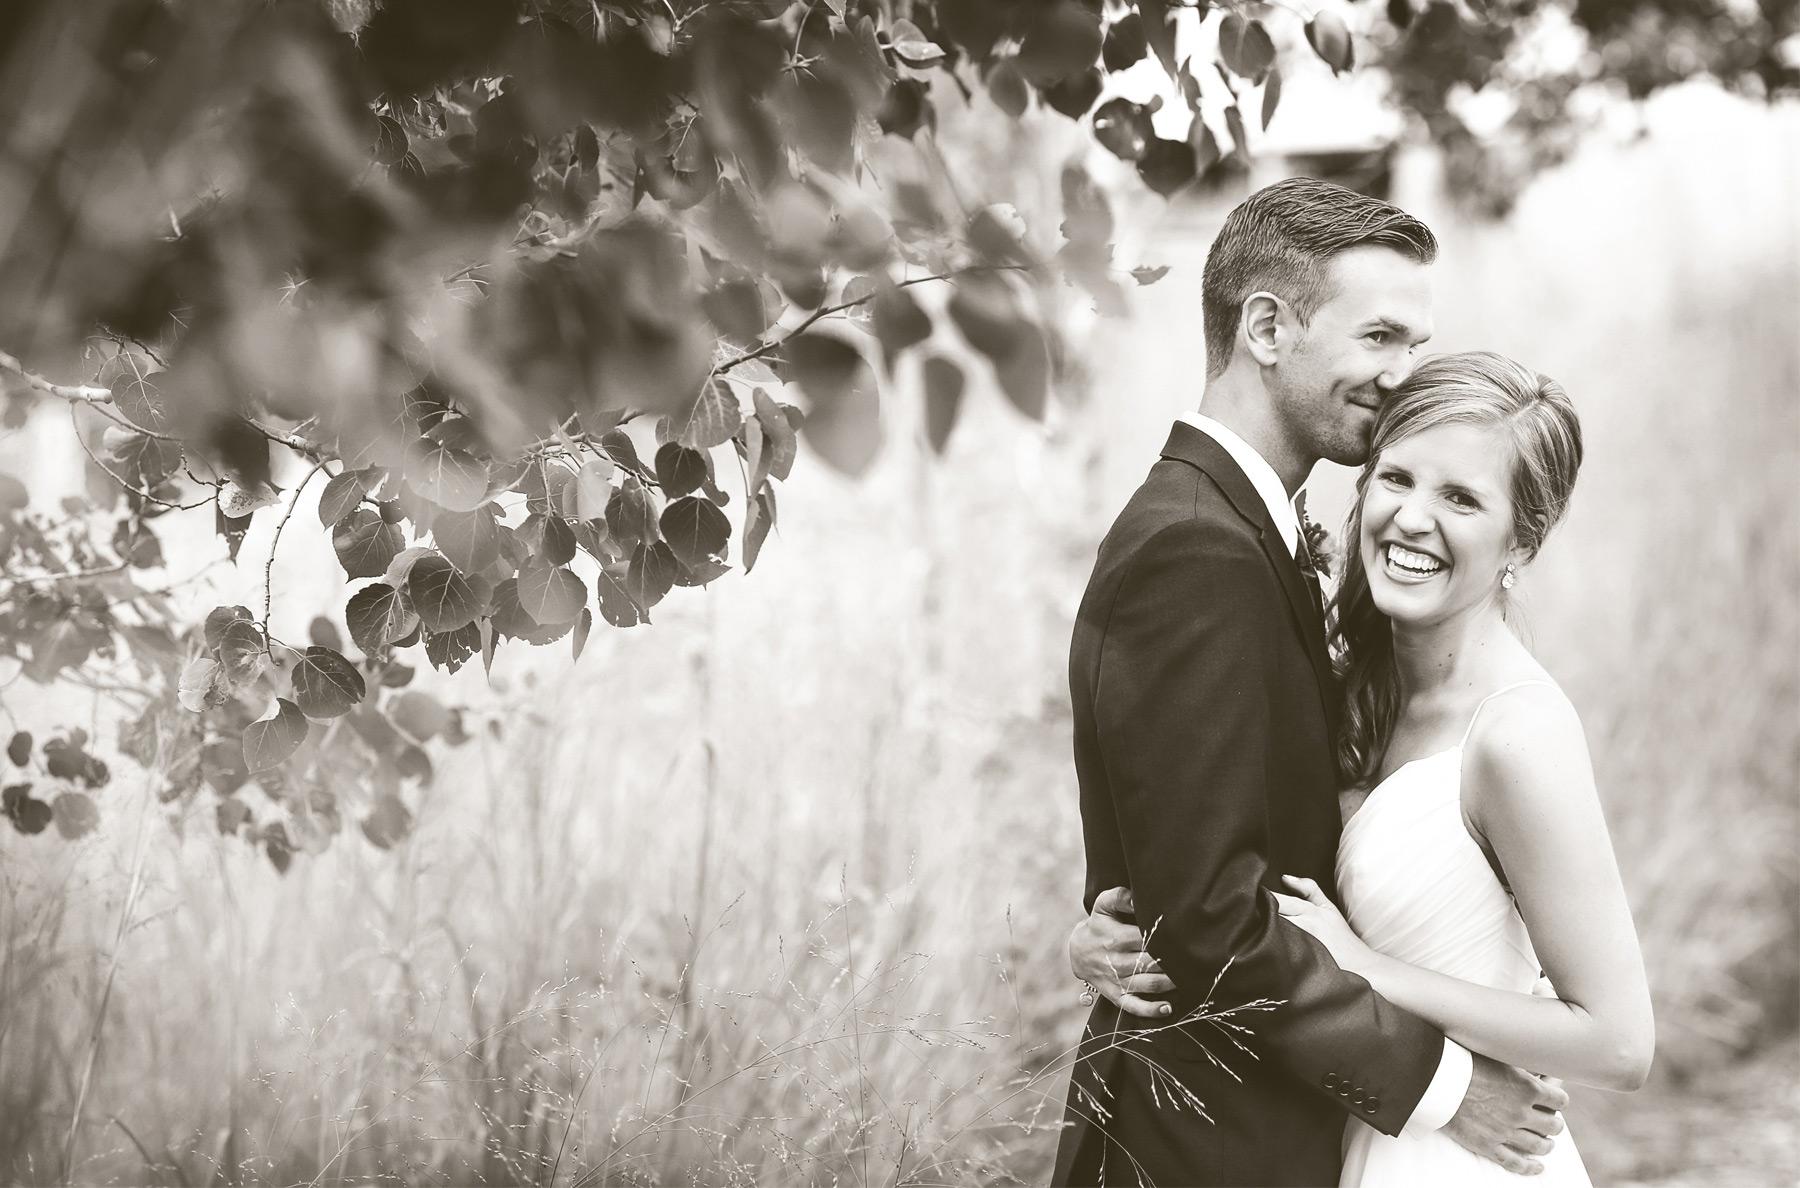 03-Minneapolis-Minnesota-Wedding-Photography-by-Vick-Photography-Field-First-Look-Jess-&-Jake.jpg